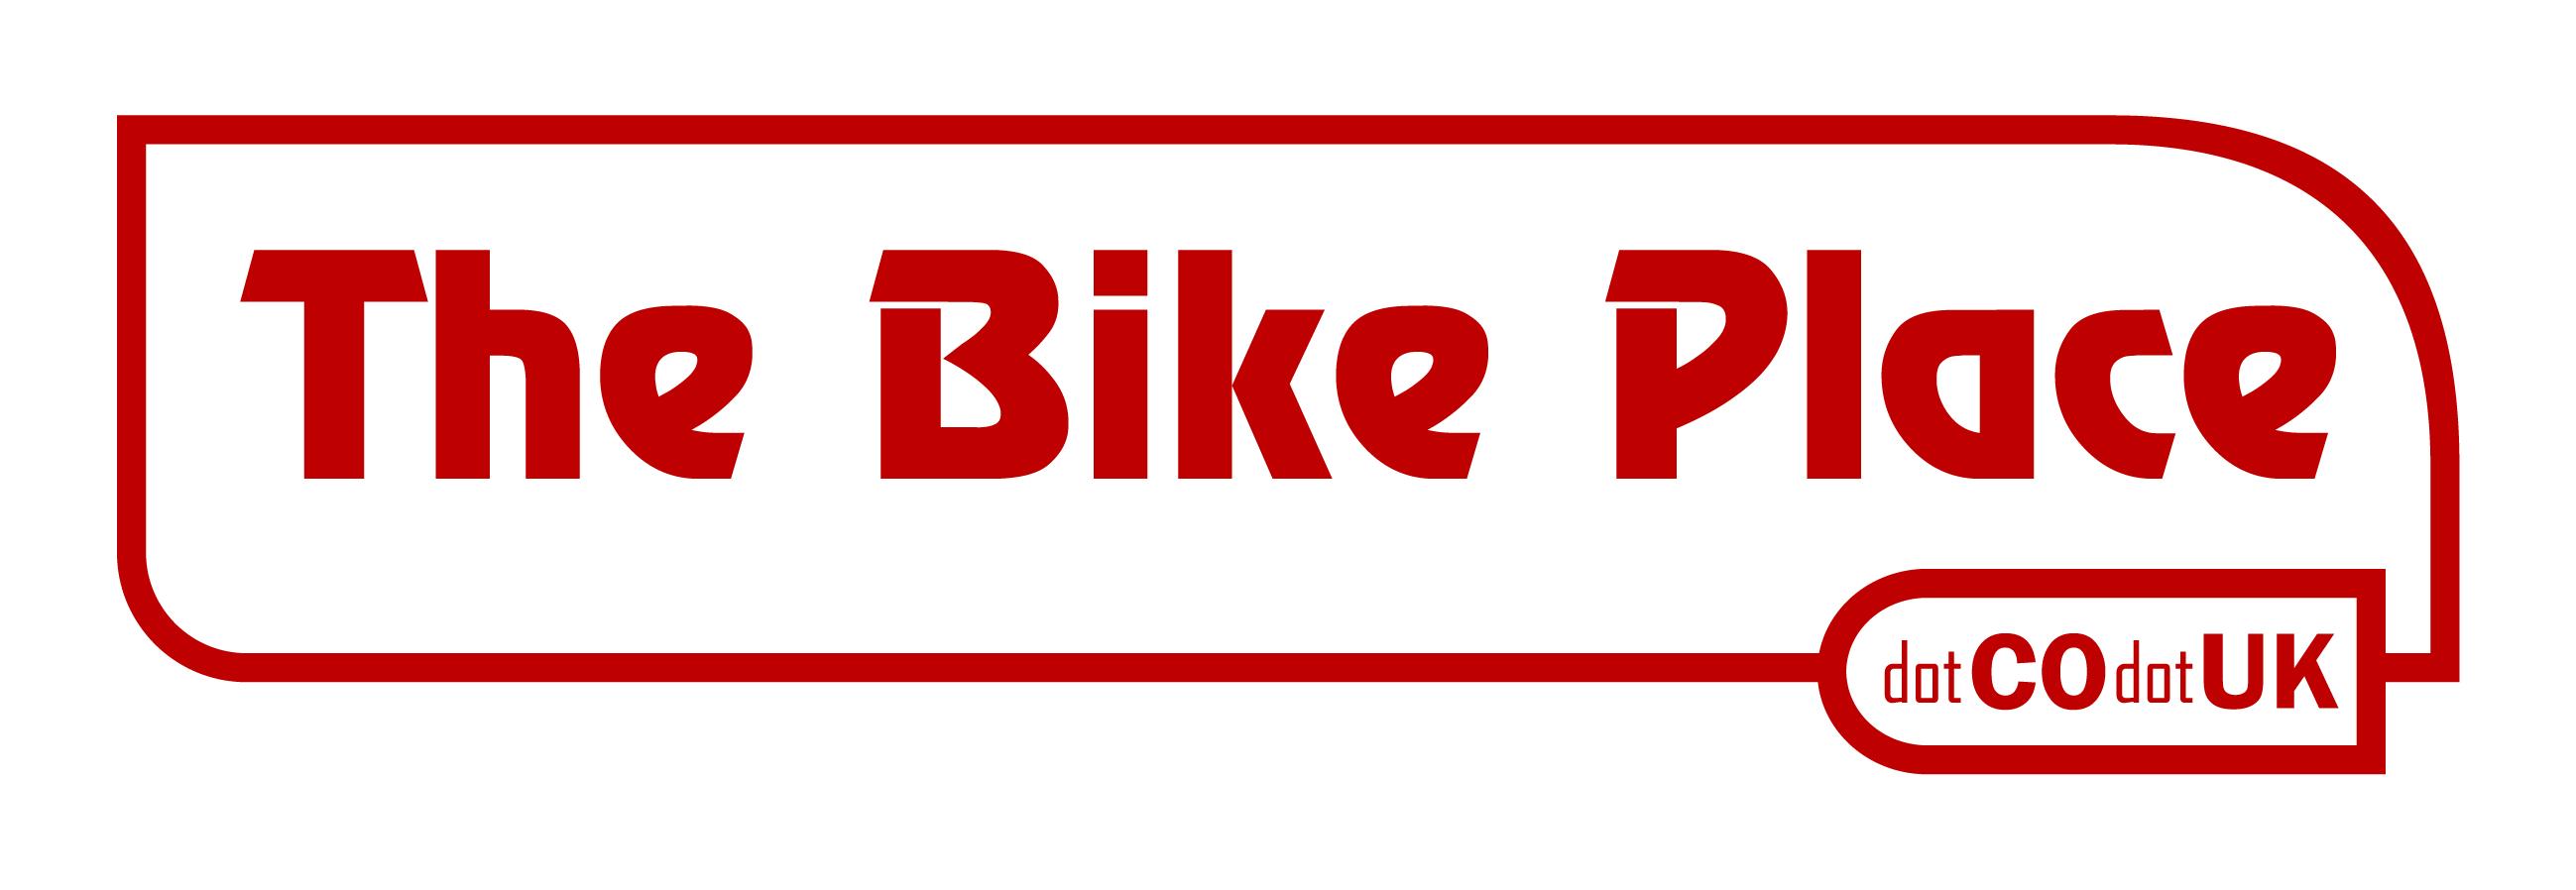 the_bike_place__van_logo